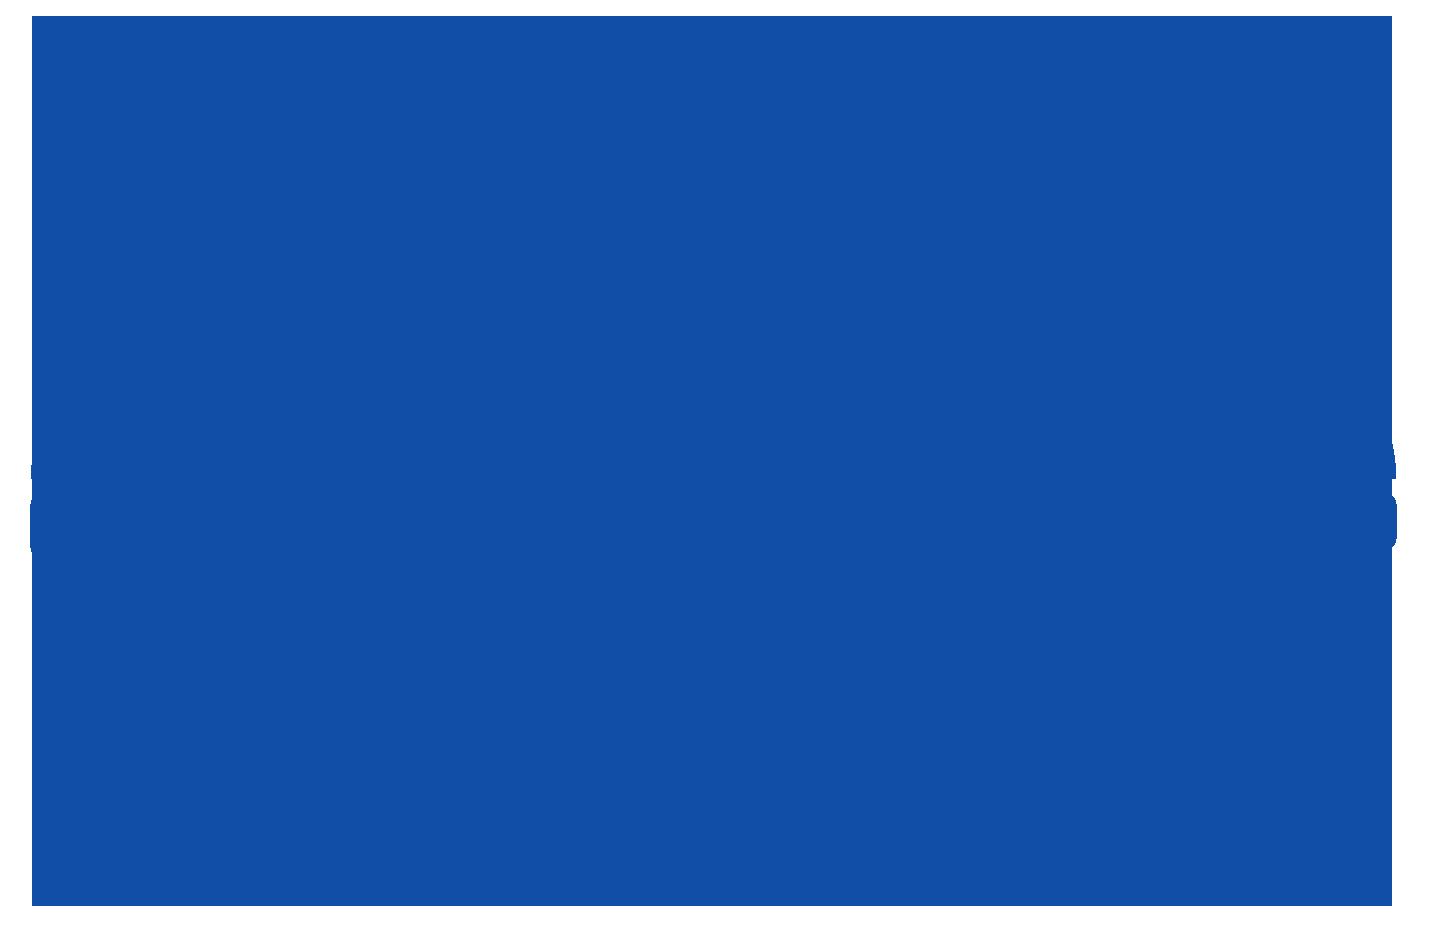 SendBeatsTo Blue Logo, No Typography, Transparent Background